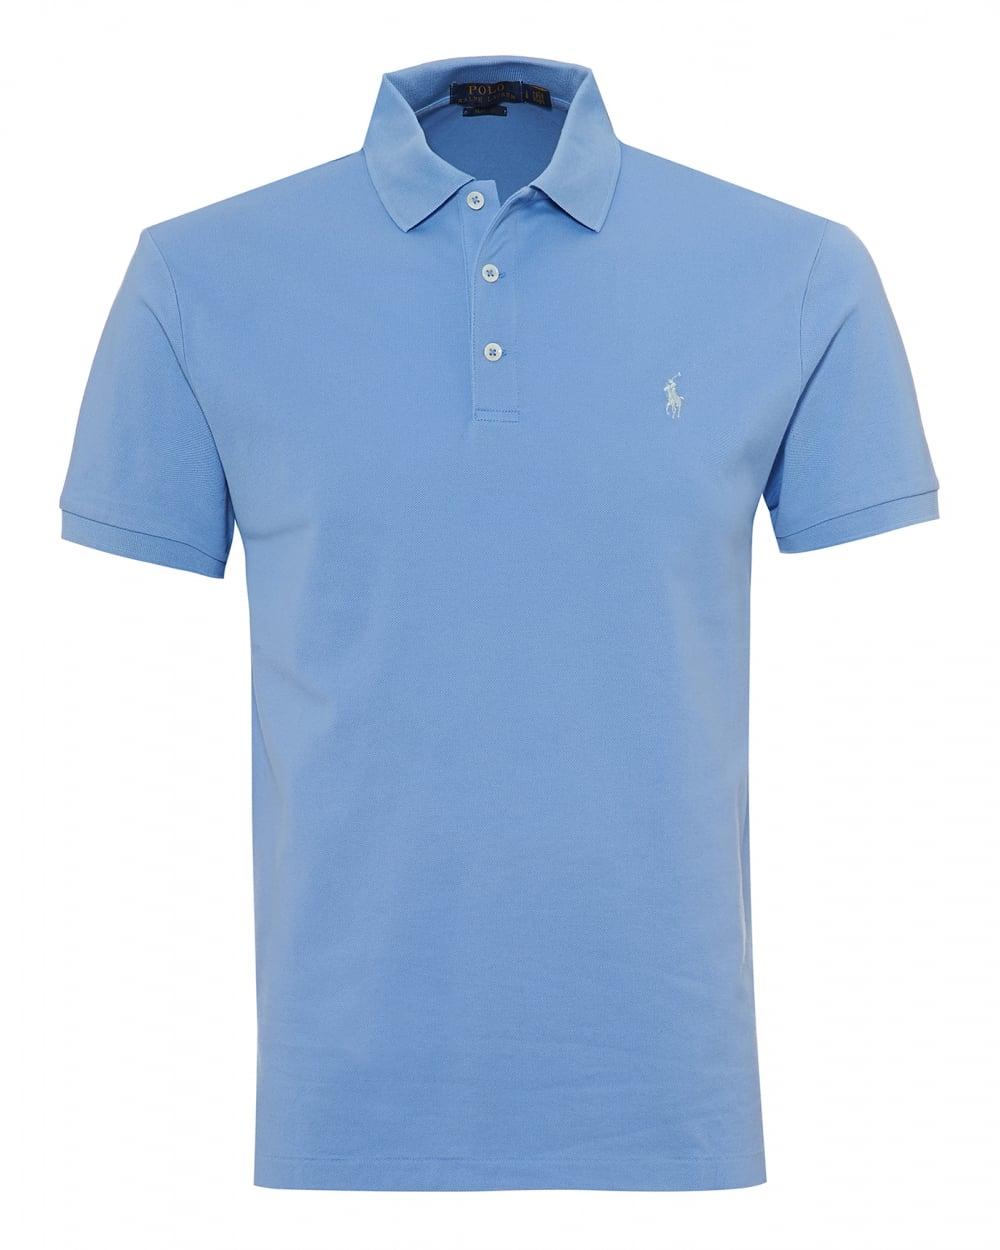 cc4738453fb23 Ralph Lauren Mens Mesh Polo Shirt